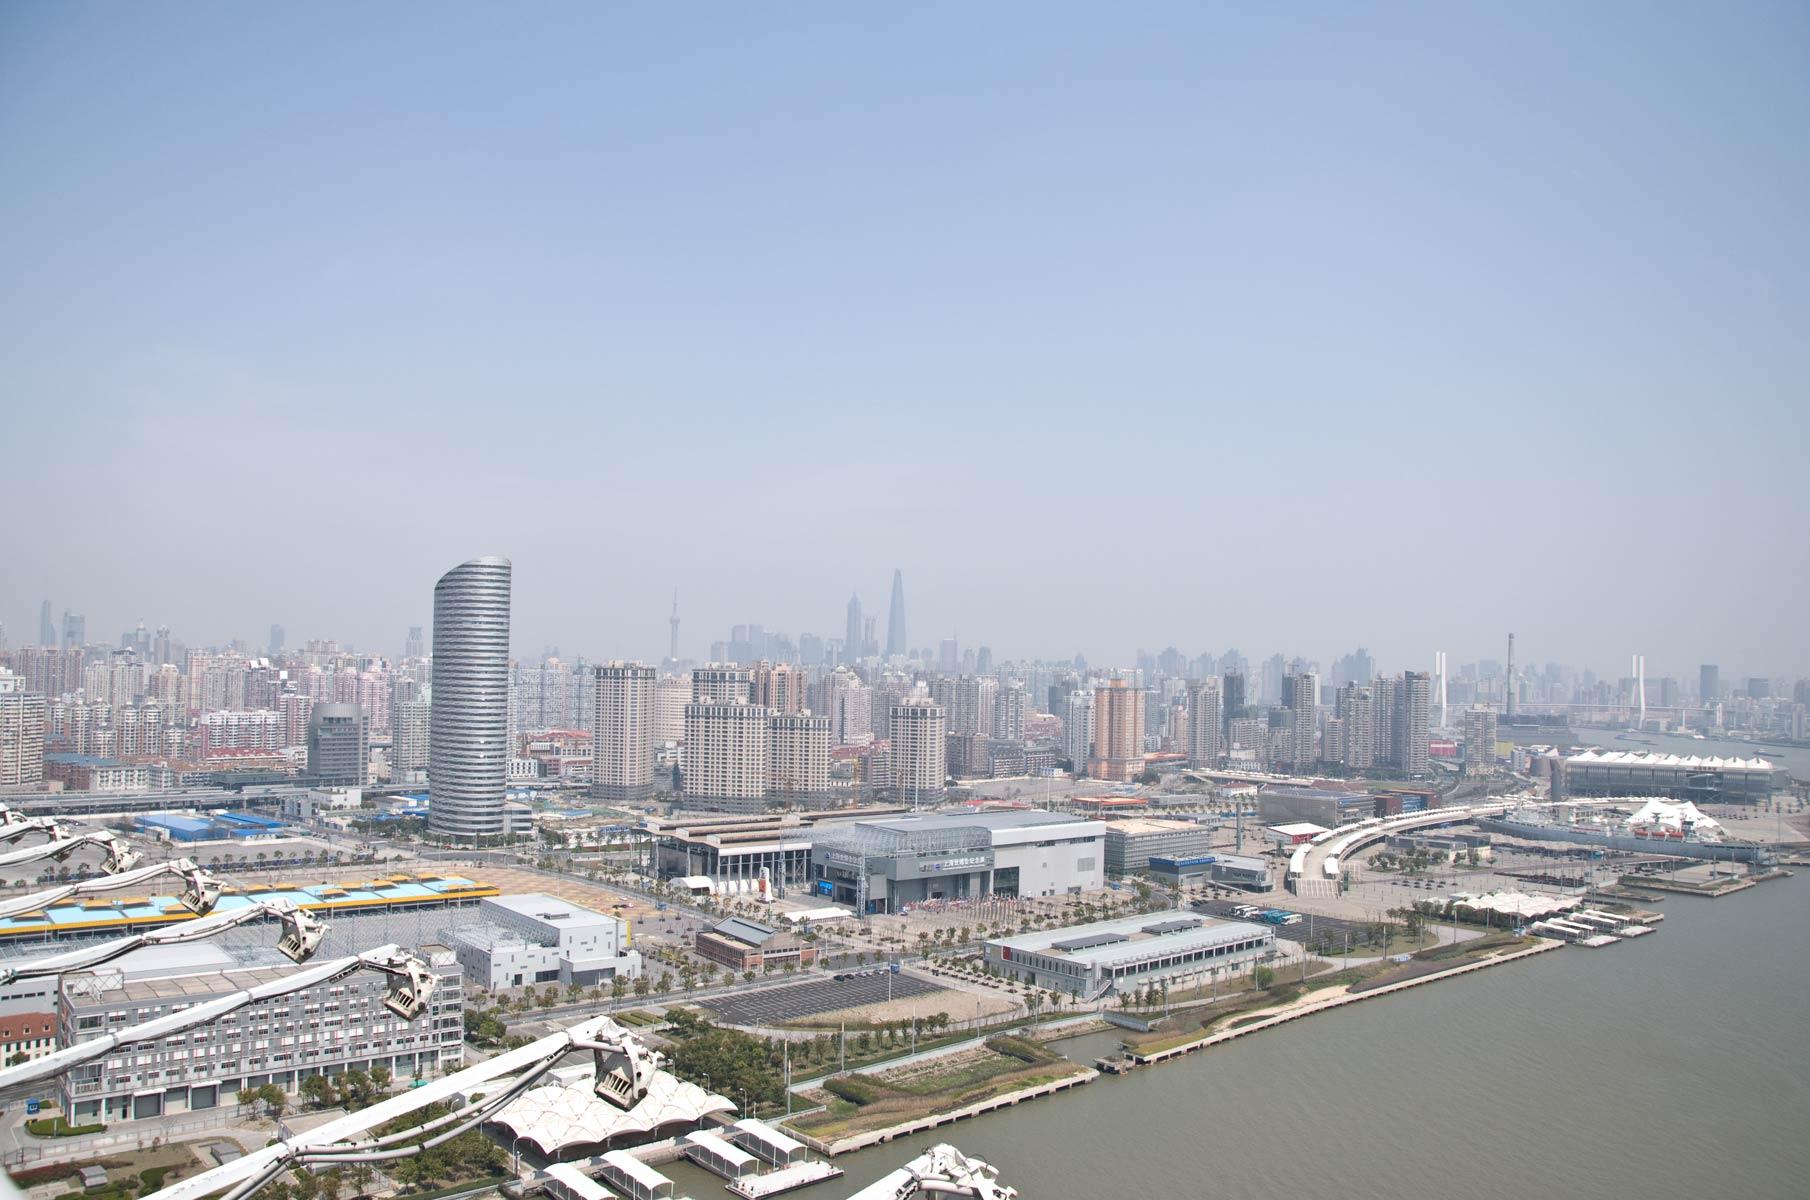 Blick von der Nanpu Bogenbrücke in Richtung Lujiazui in Shanghai, China